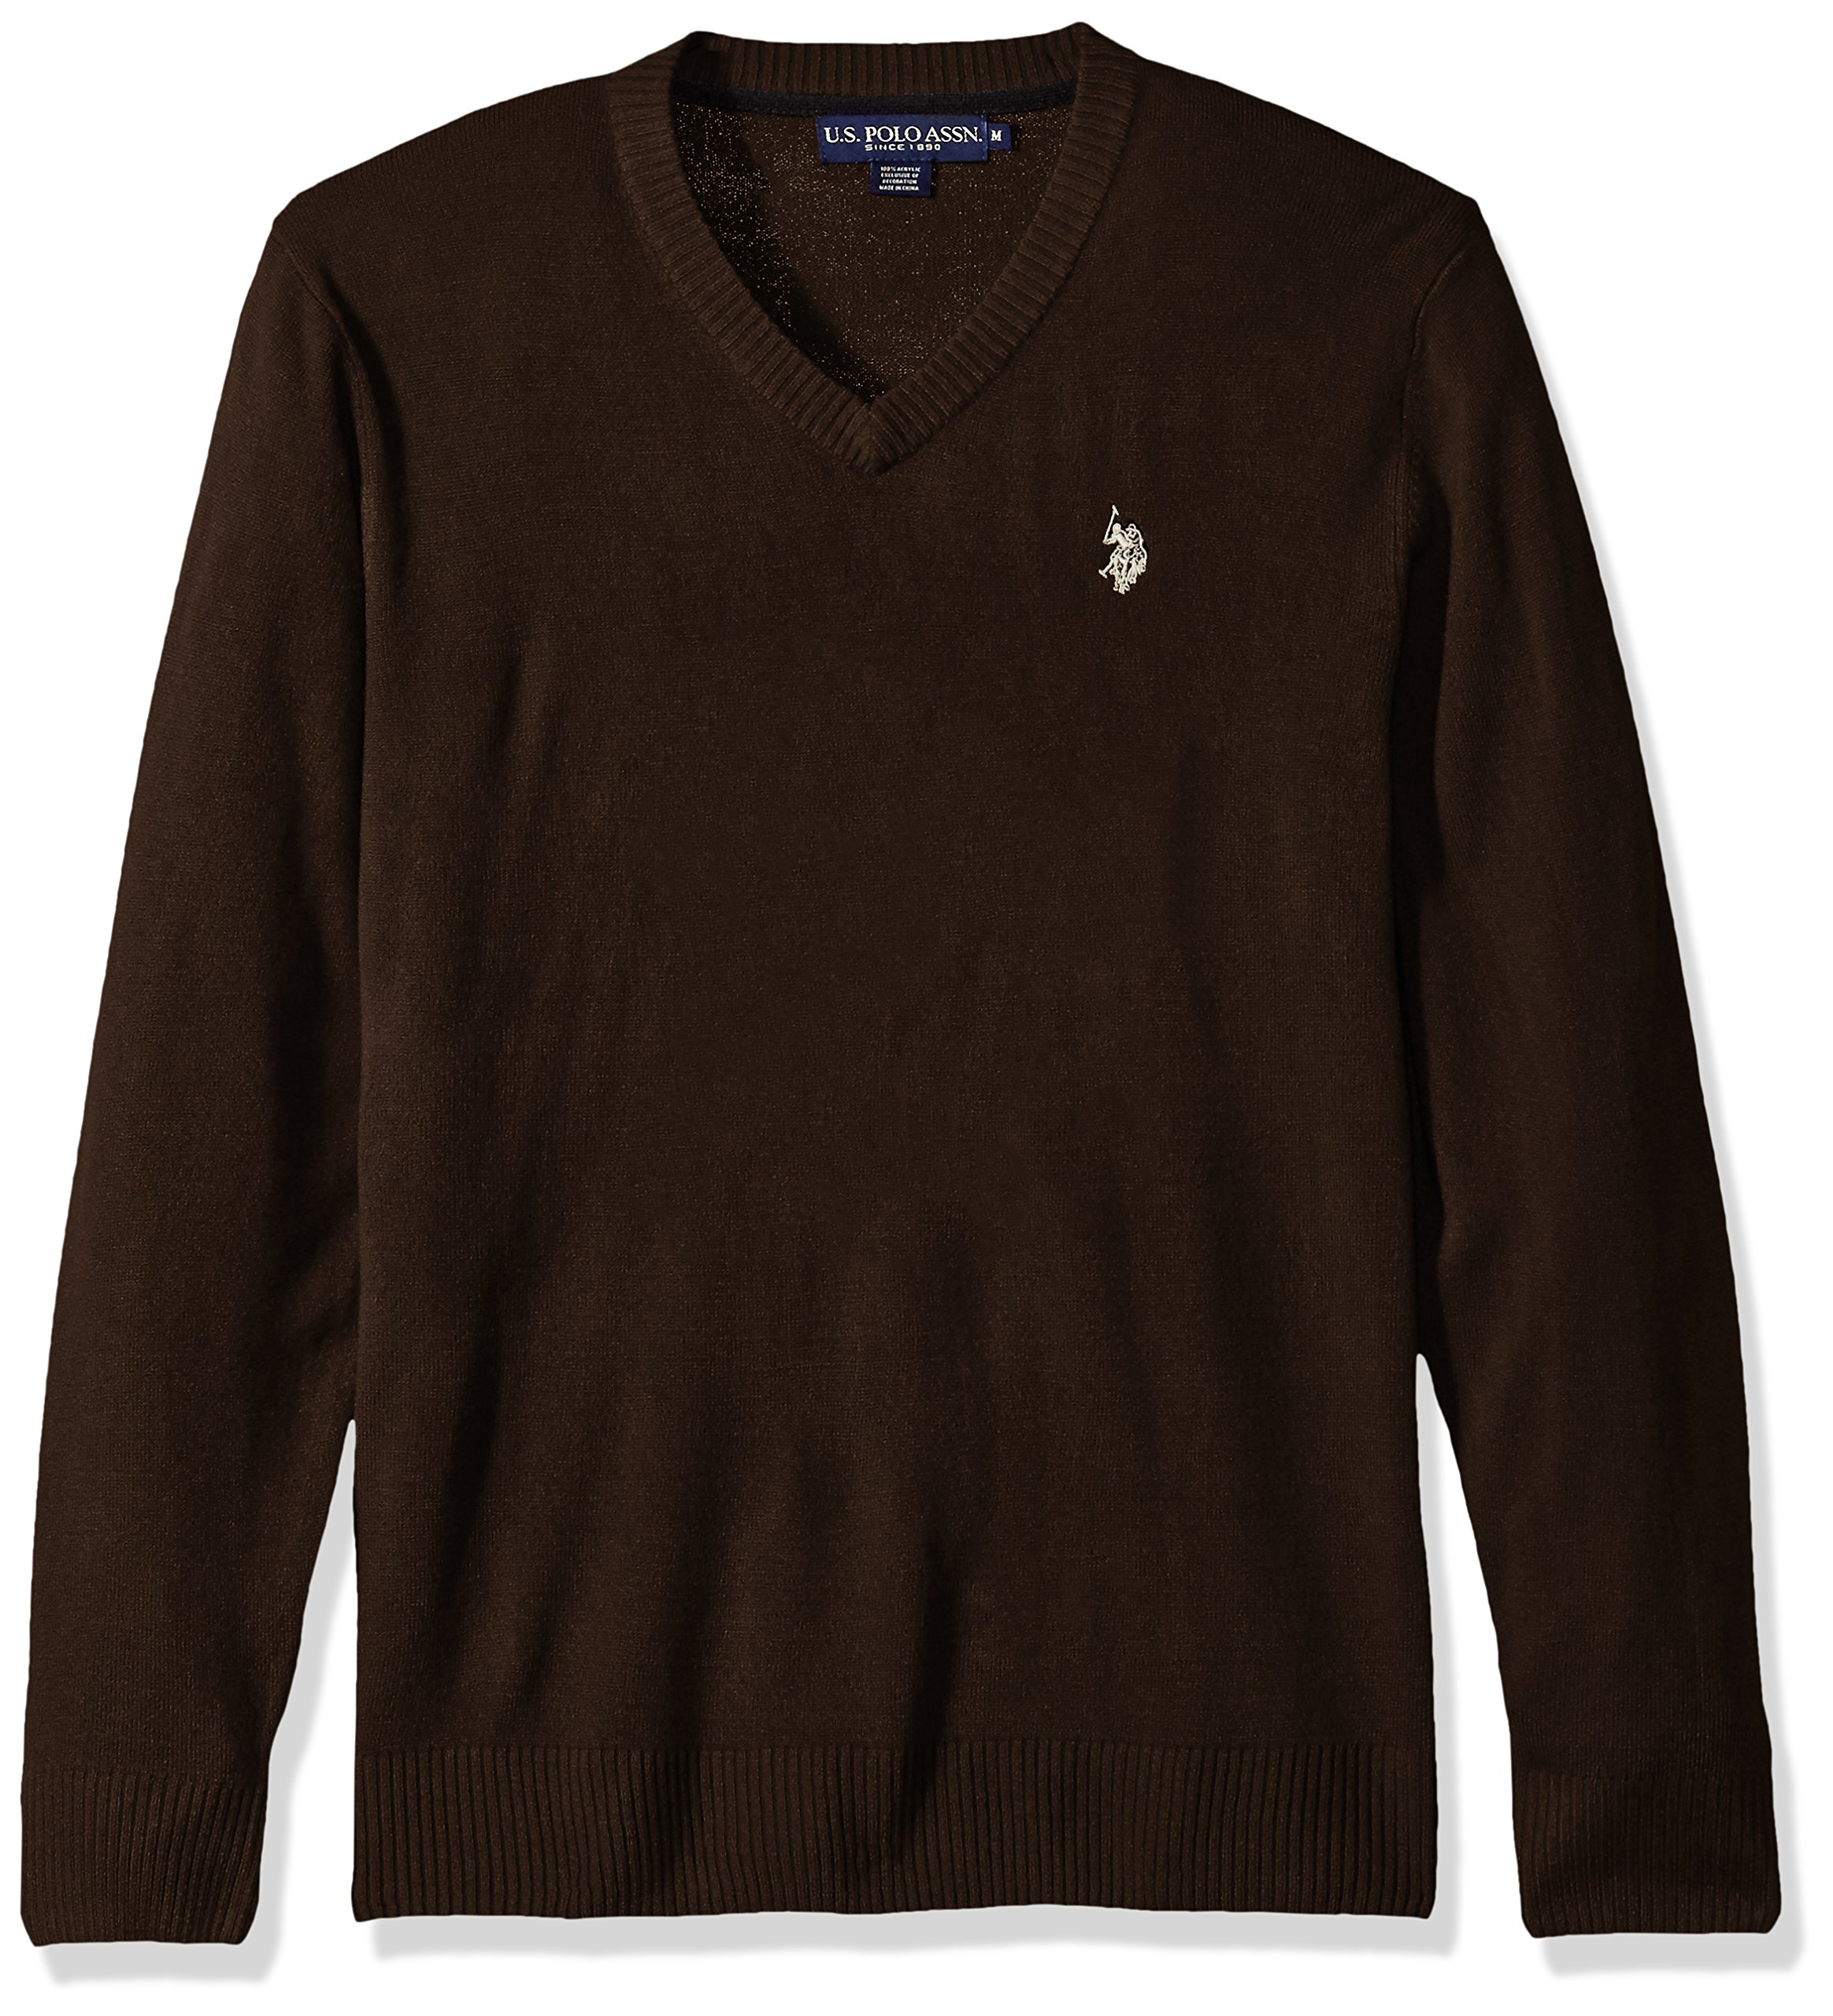 U.S. Polo Assn. Men's Solid V-Neck Sweater, Mocha Heather, XX-Large